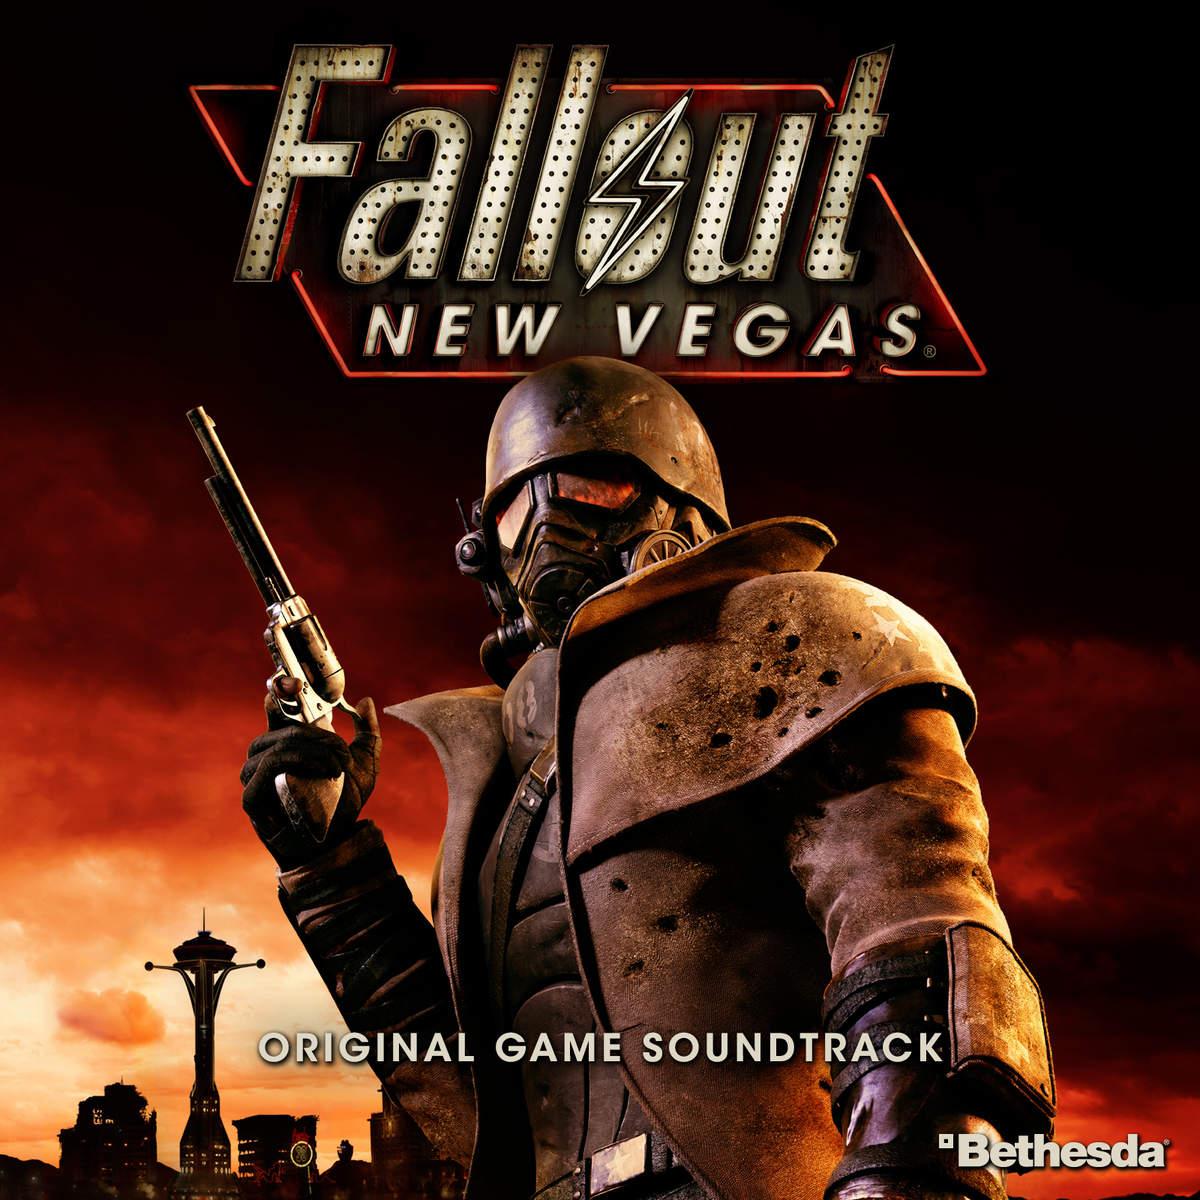 Fallout_New_Vegas_Original_Game_Soundtrack__cover1200x1200.jpg